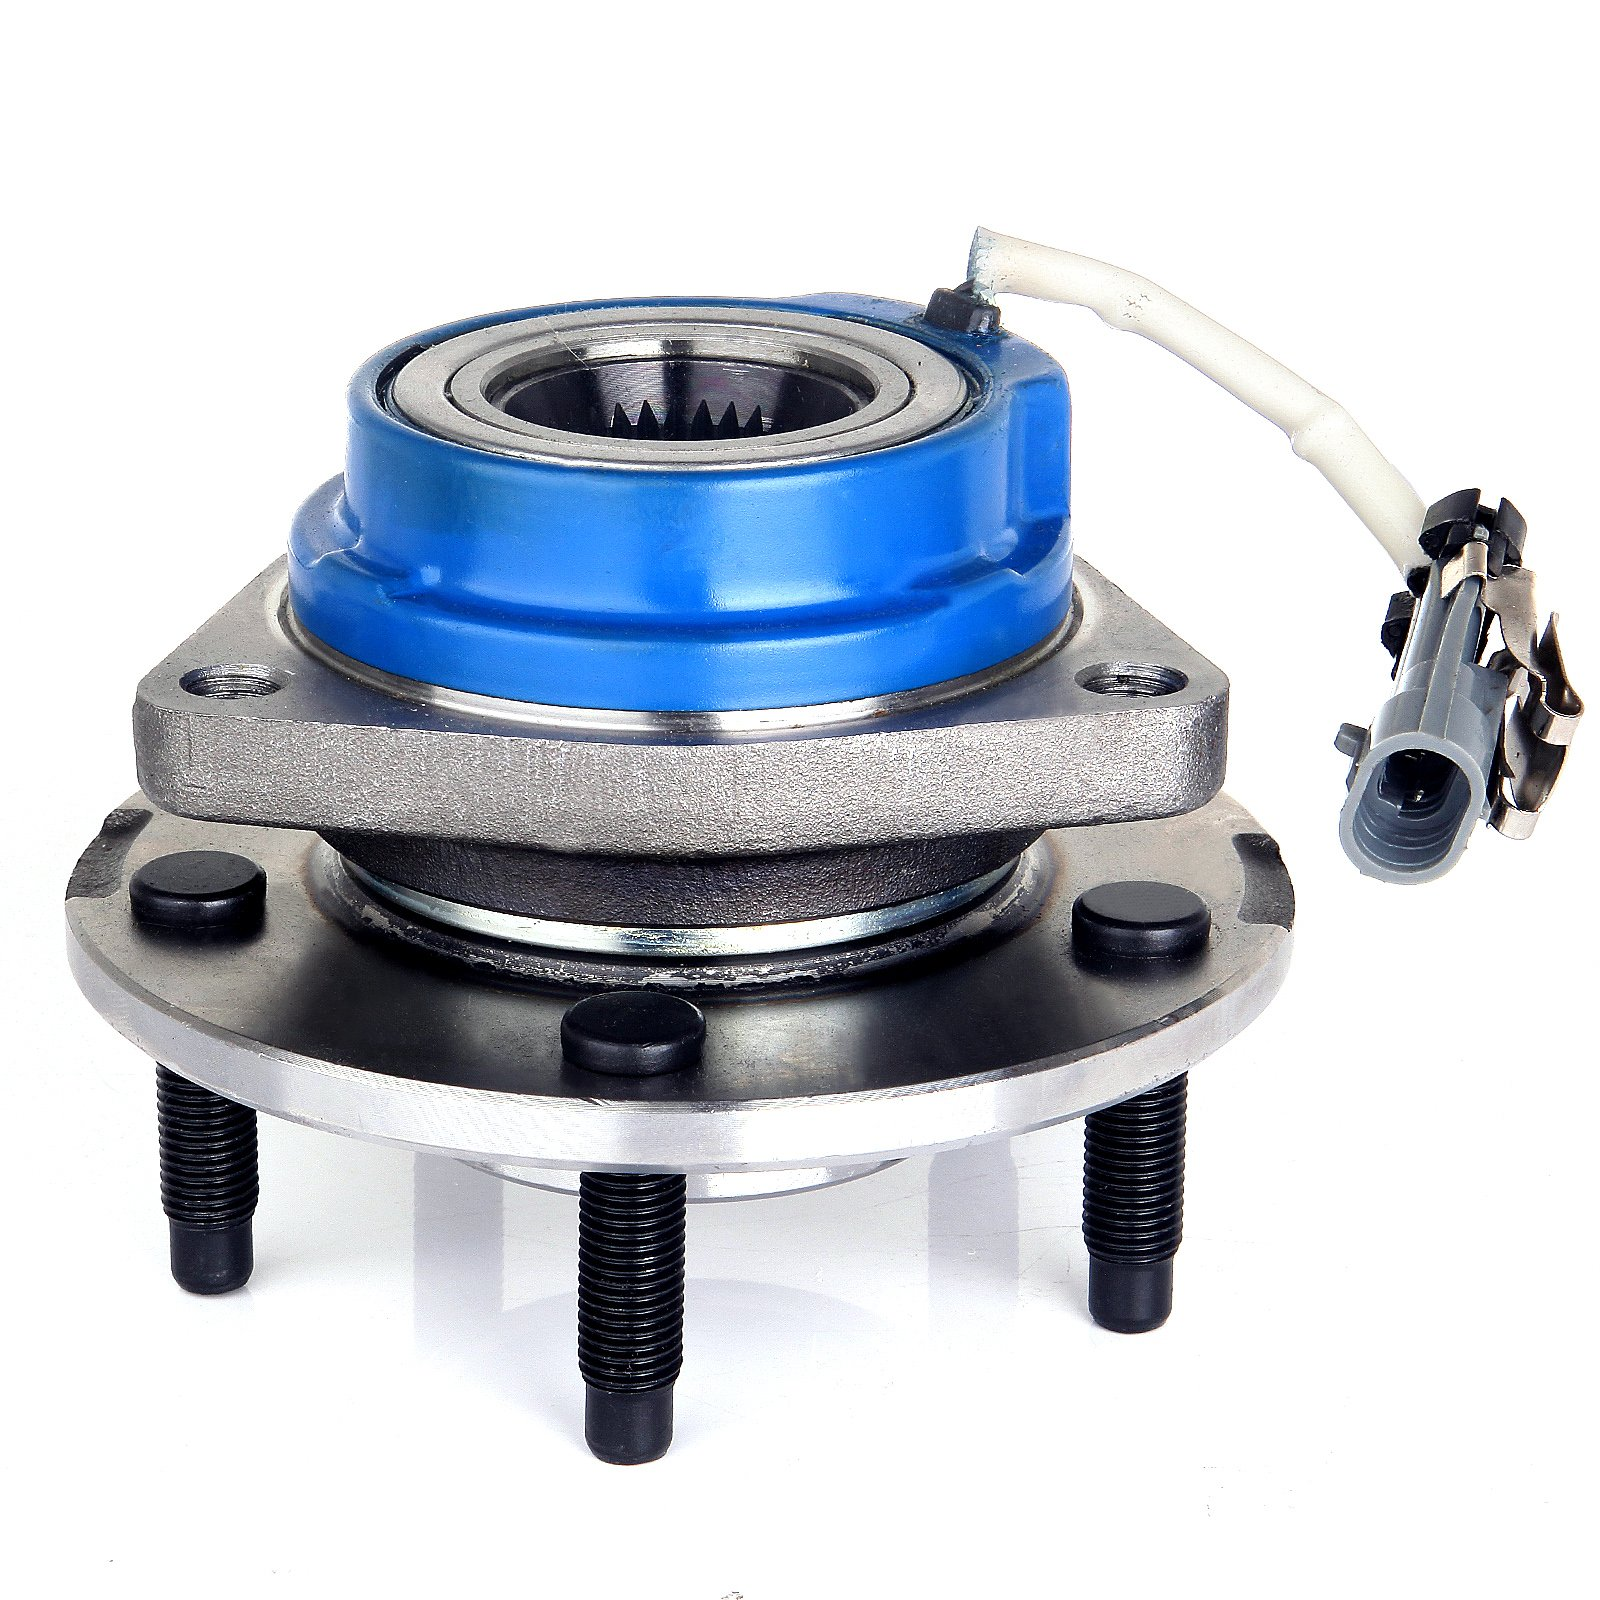 ECCPP 513121 Wheel Bearing Hub Front Wheel Hub and Bearing Assembly Allure, Aurora, Bonnevile, Century, Impala 5 Lug W/ ABS